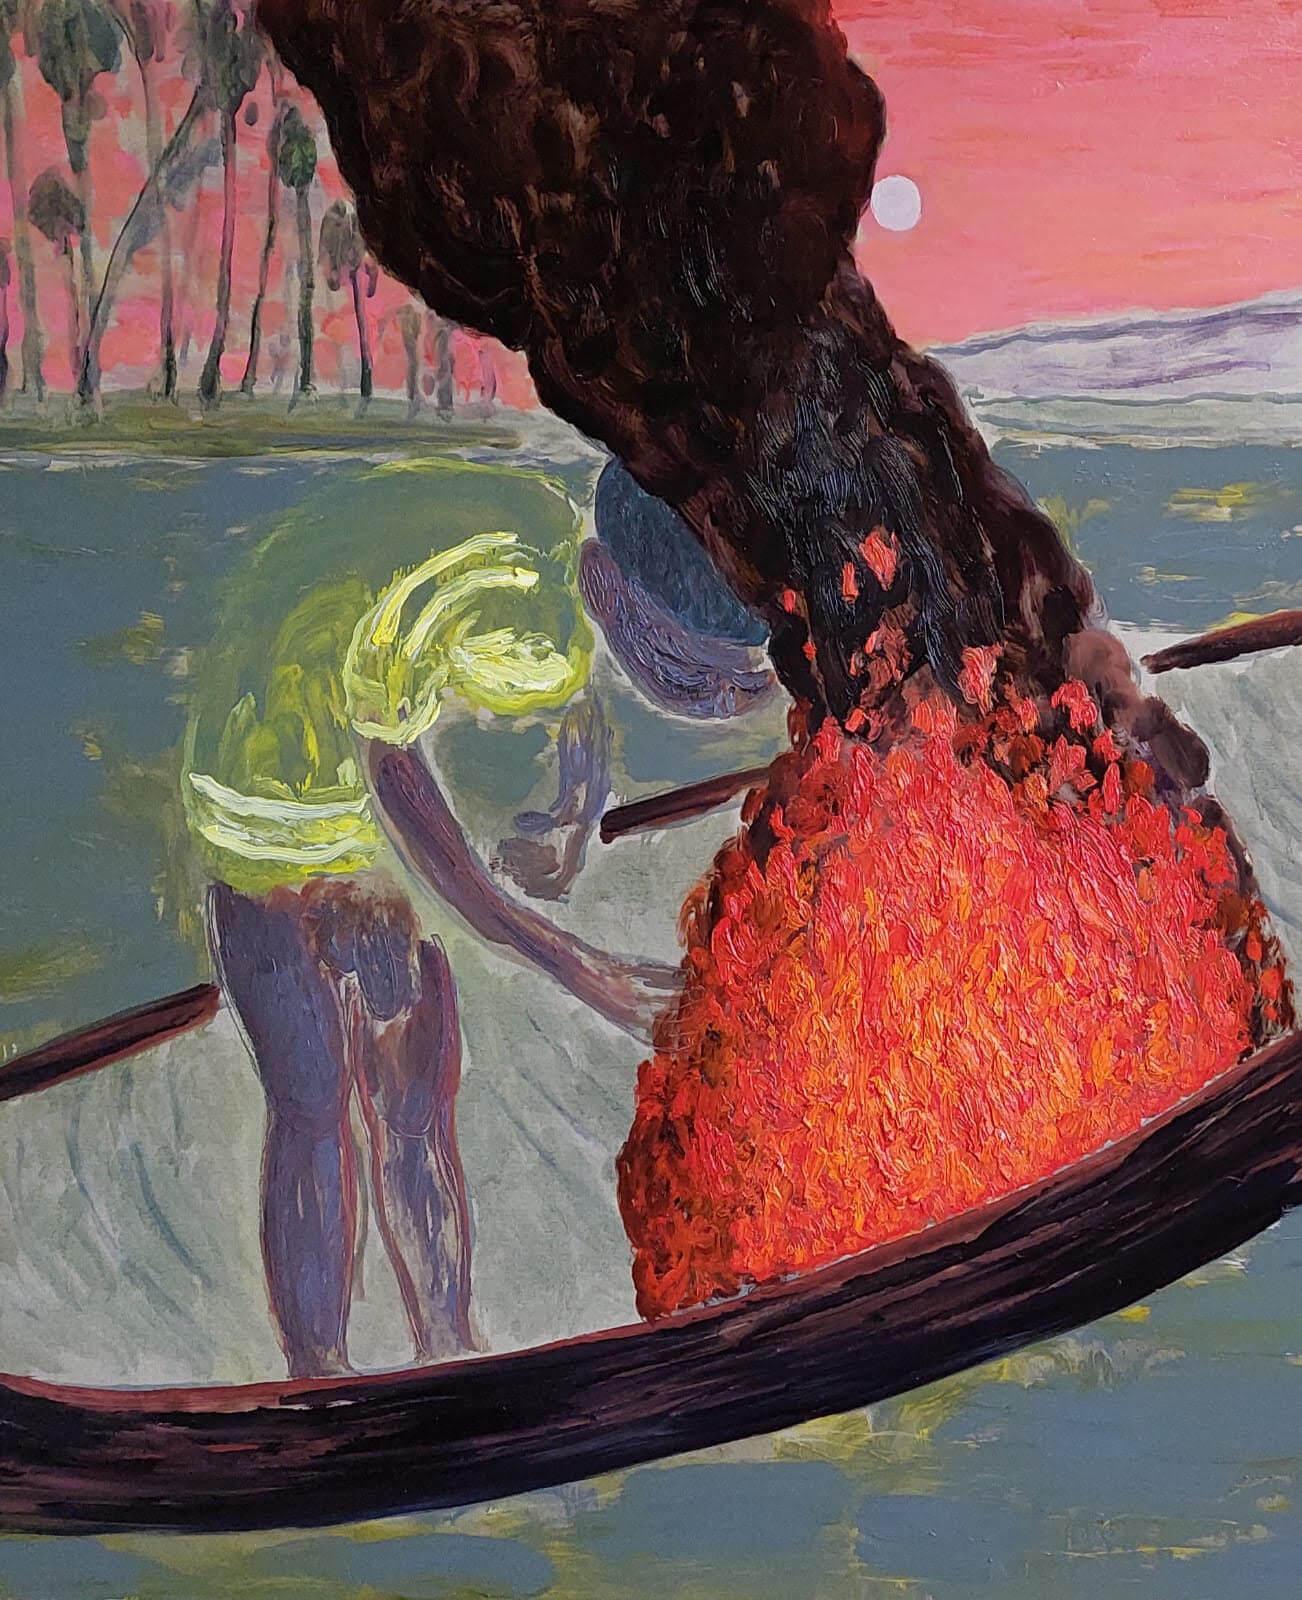 GRGUR AKRAP - Brod koji gori / A burning ship,  2021. ulje i enkaustika na platnu / oil and encaustics on canvas 130x110 cm